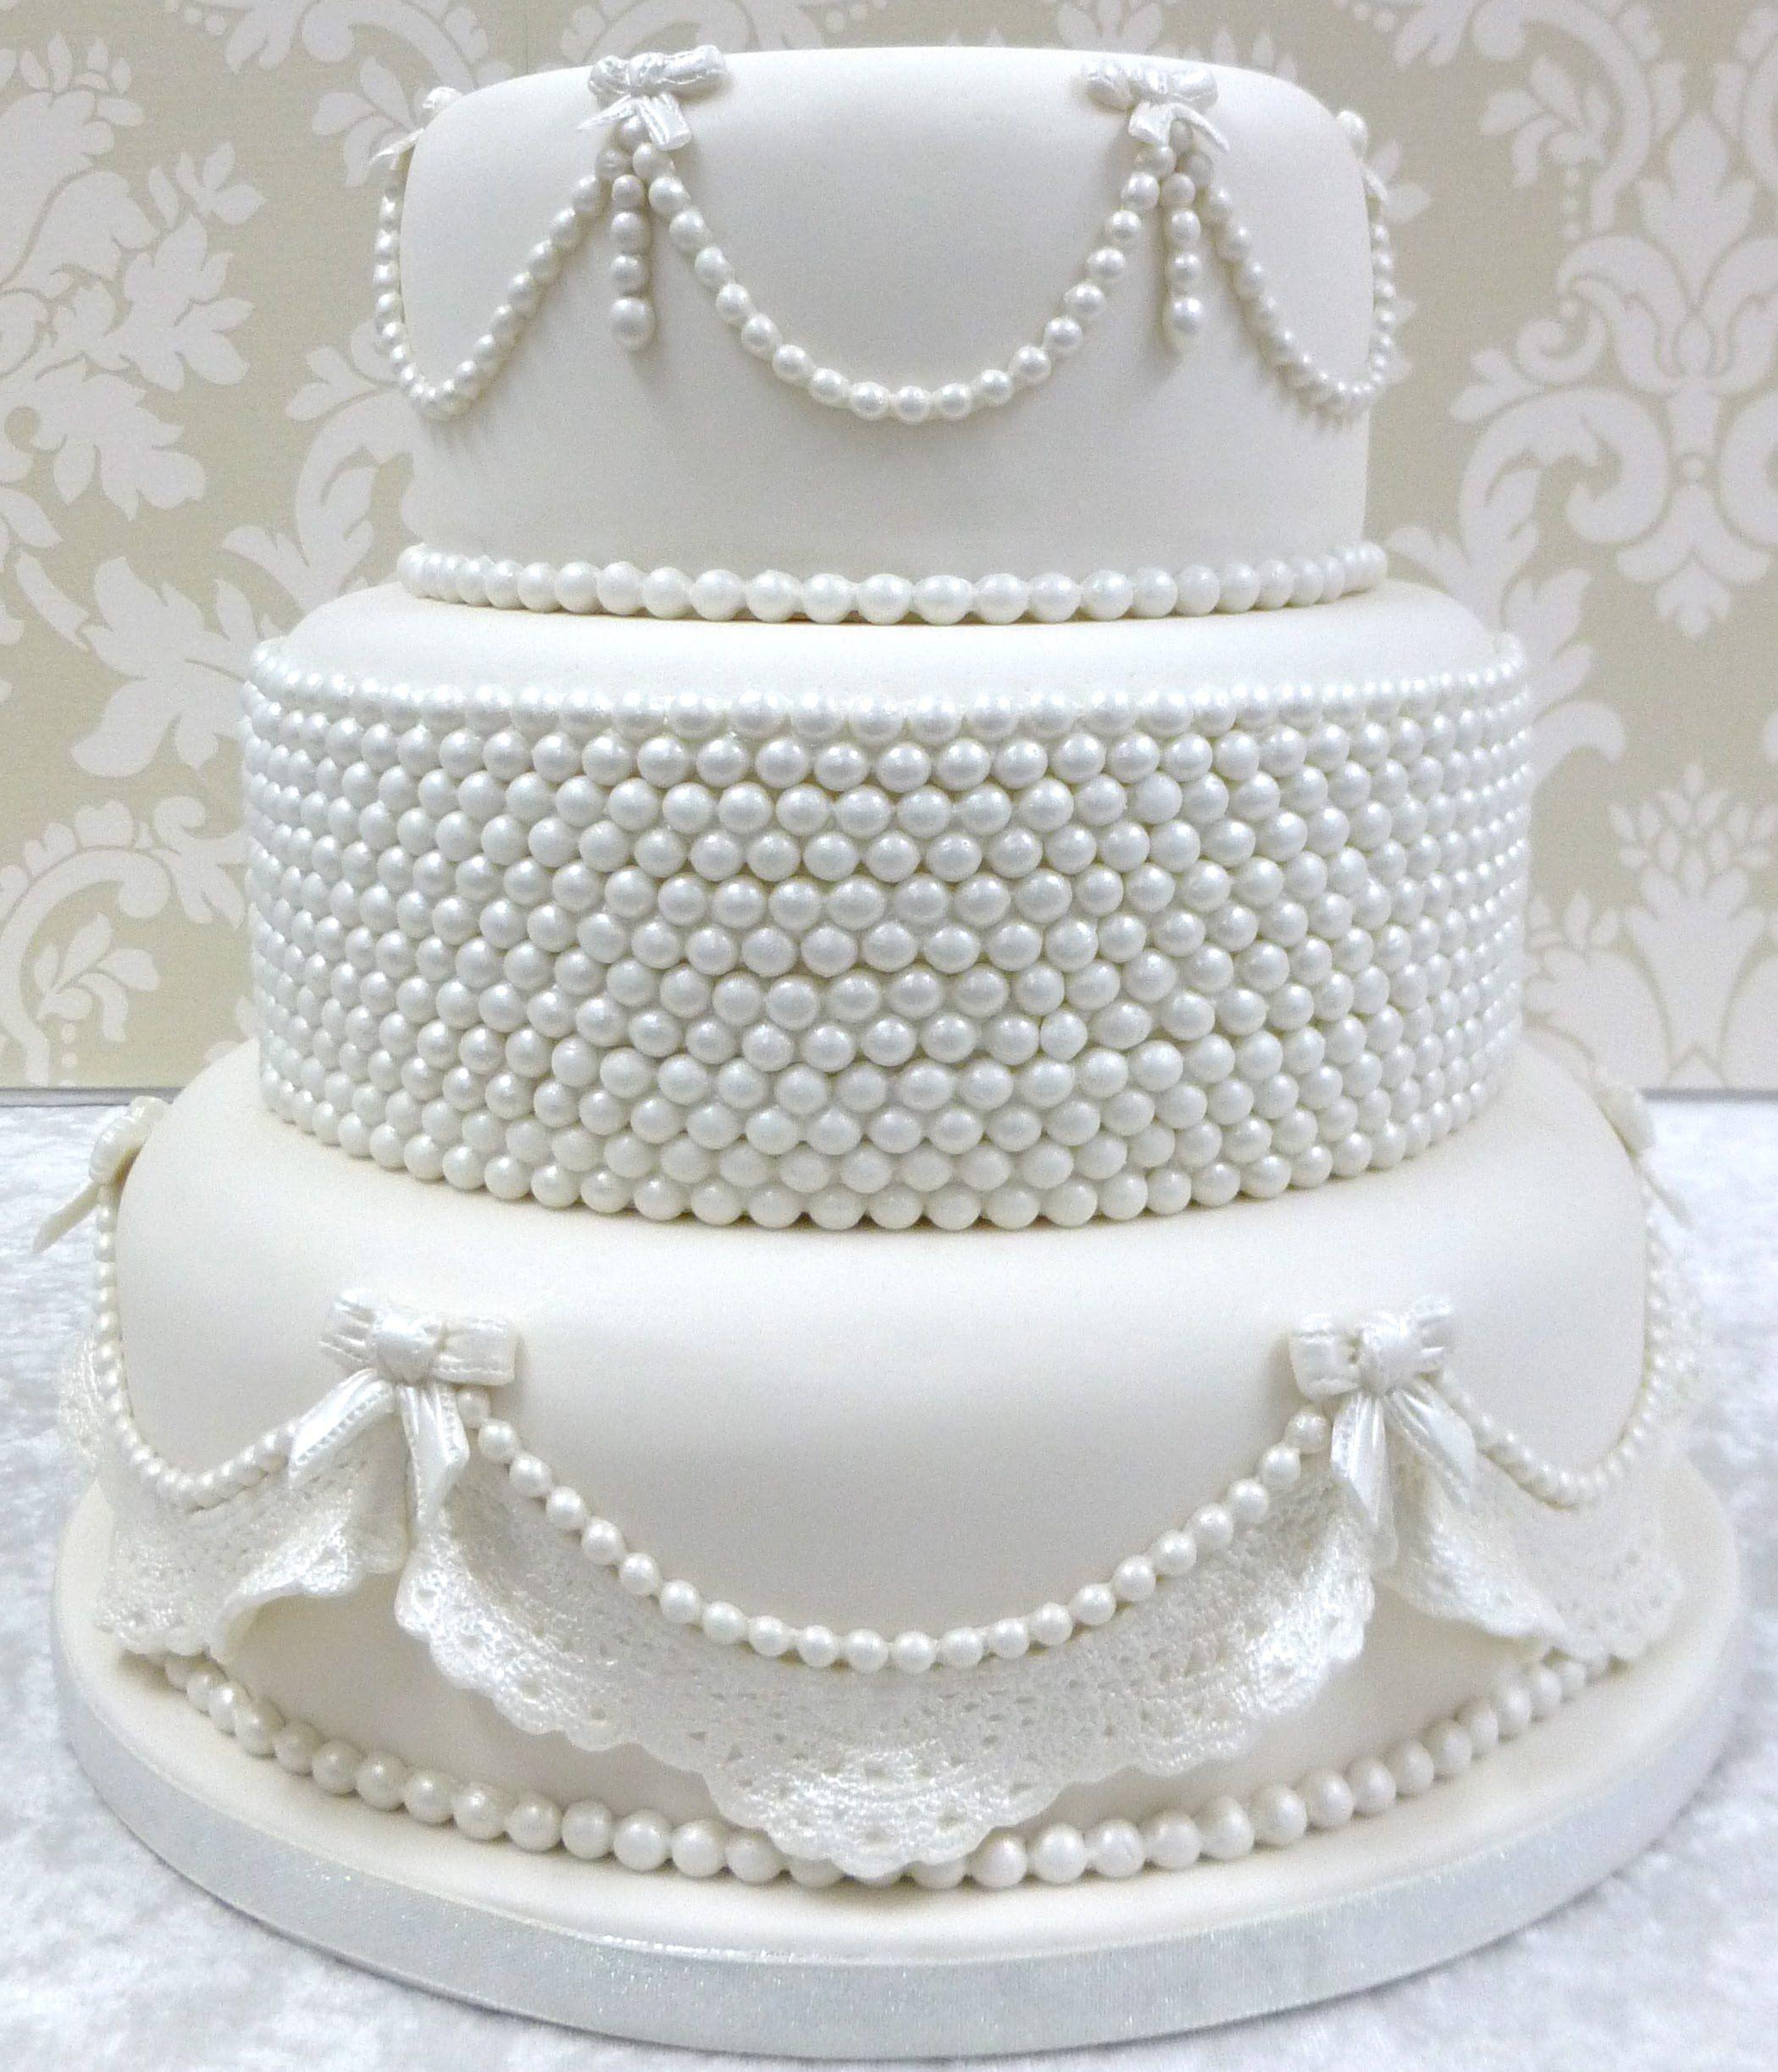 Karen Davies Cake Decorating Moulds / molds - Pearls ...